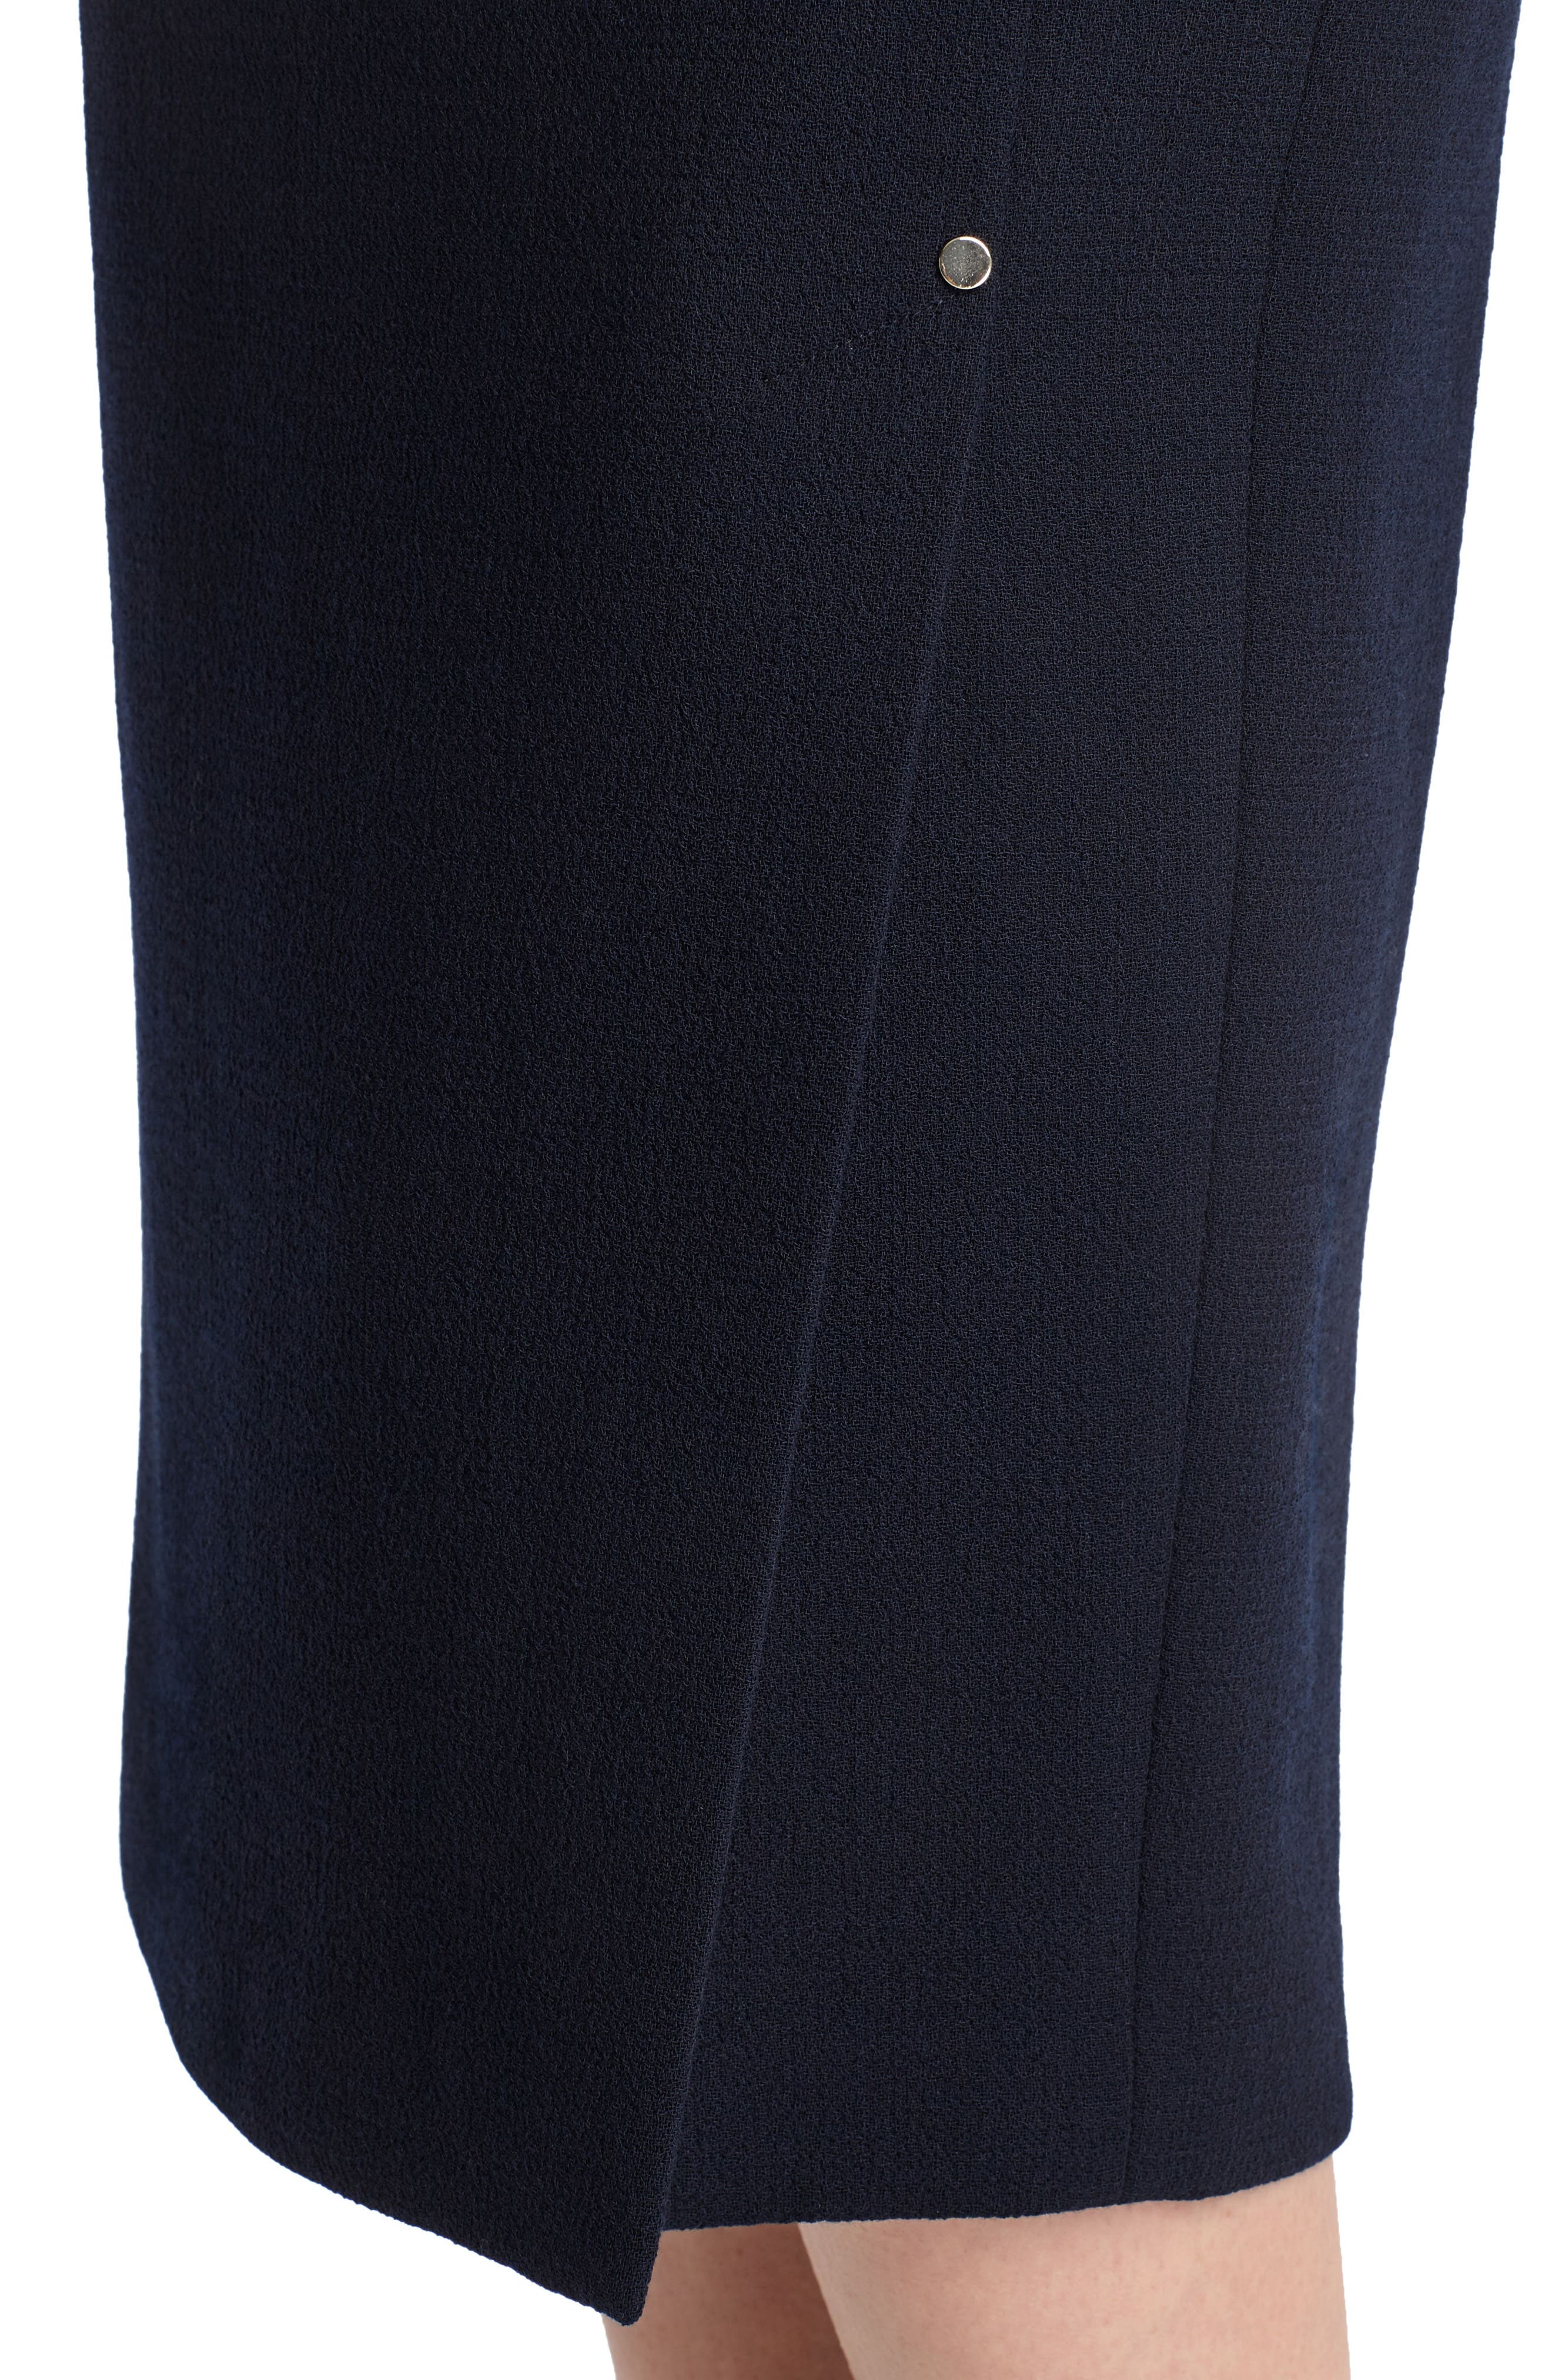 Lucina Nouveau Crepe Skirt,                             Alternate thumbnail 4, color,                             Ink